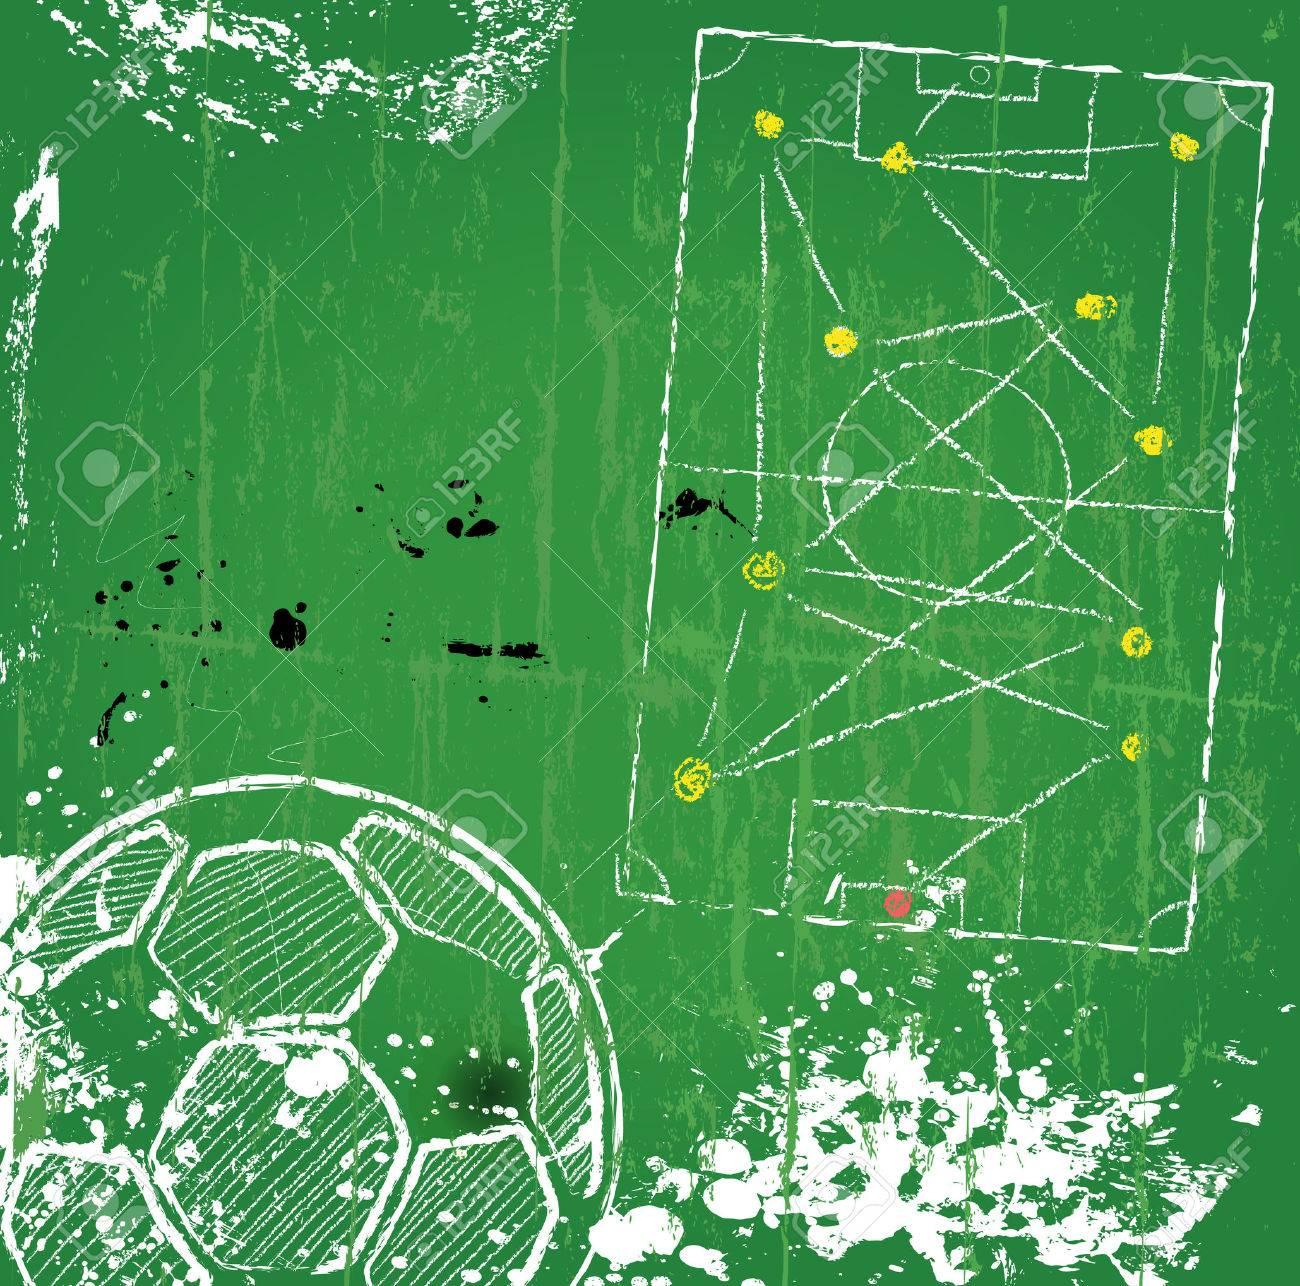 Soccer / Football design template,free copy space, vector - 24960216